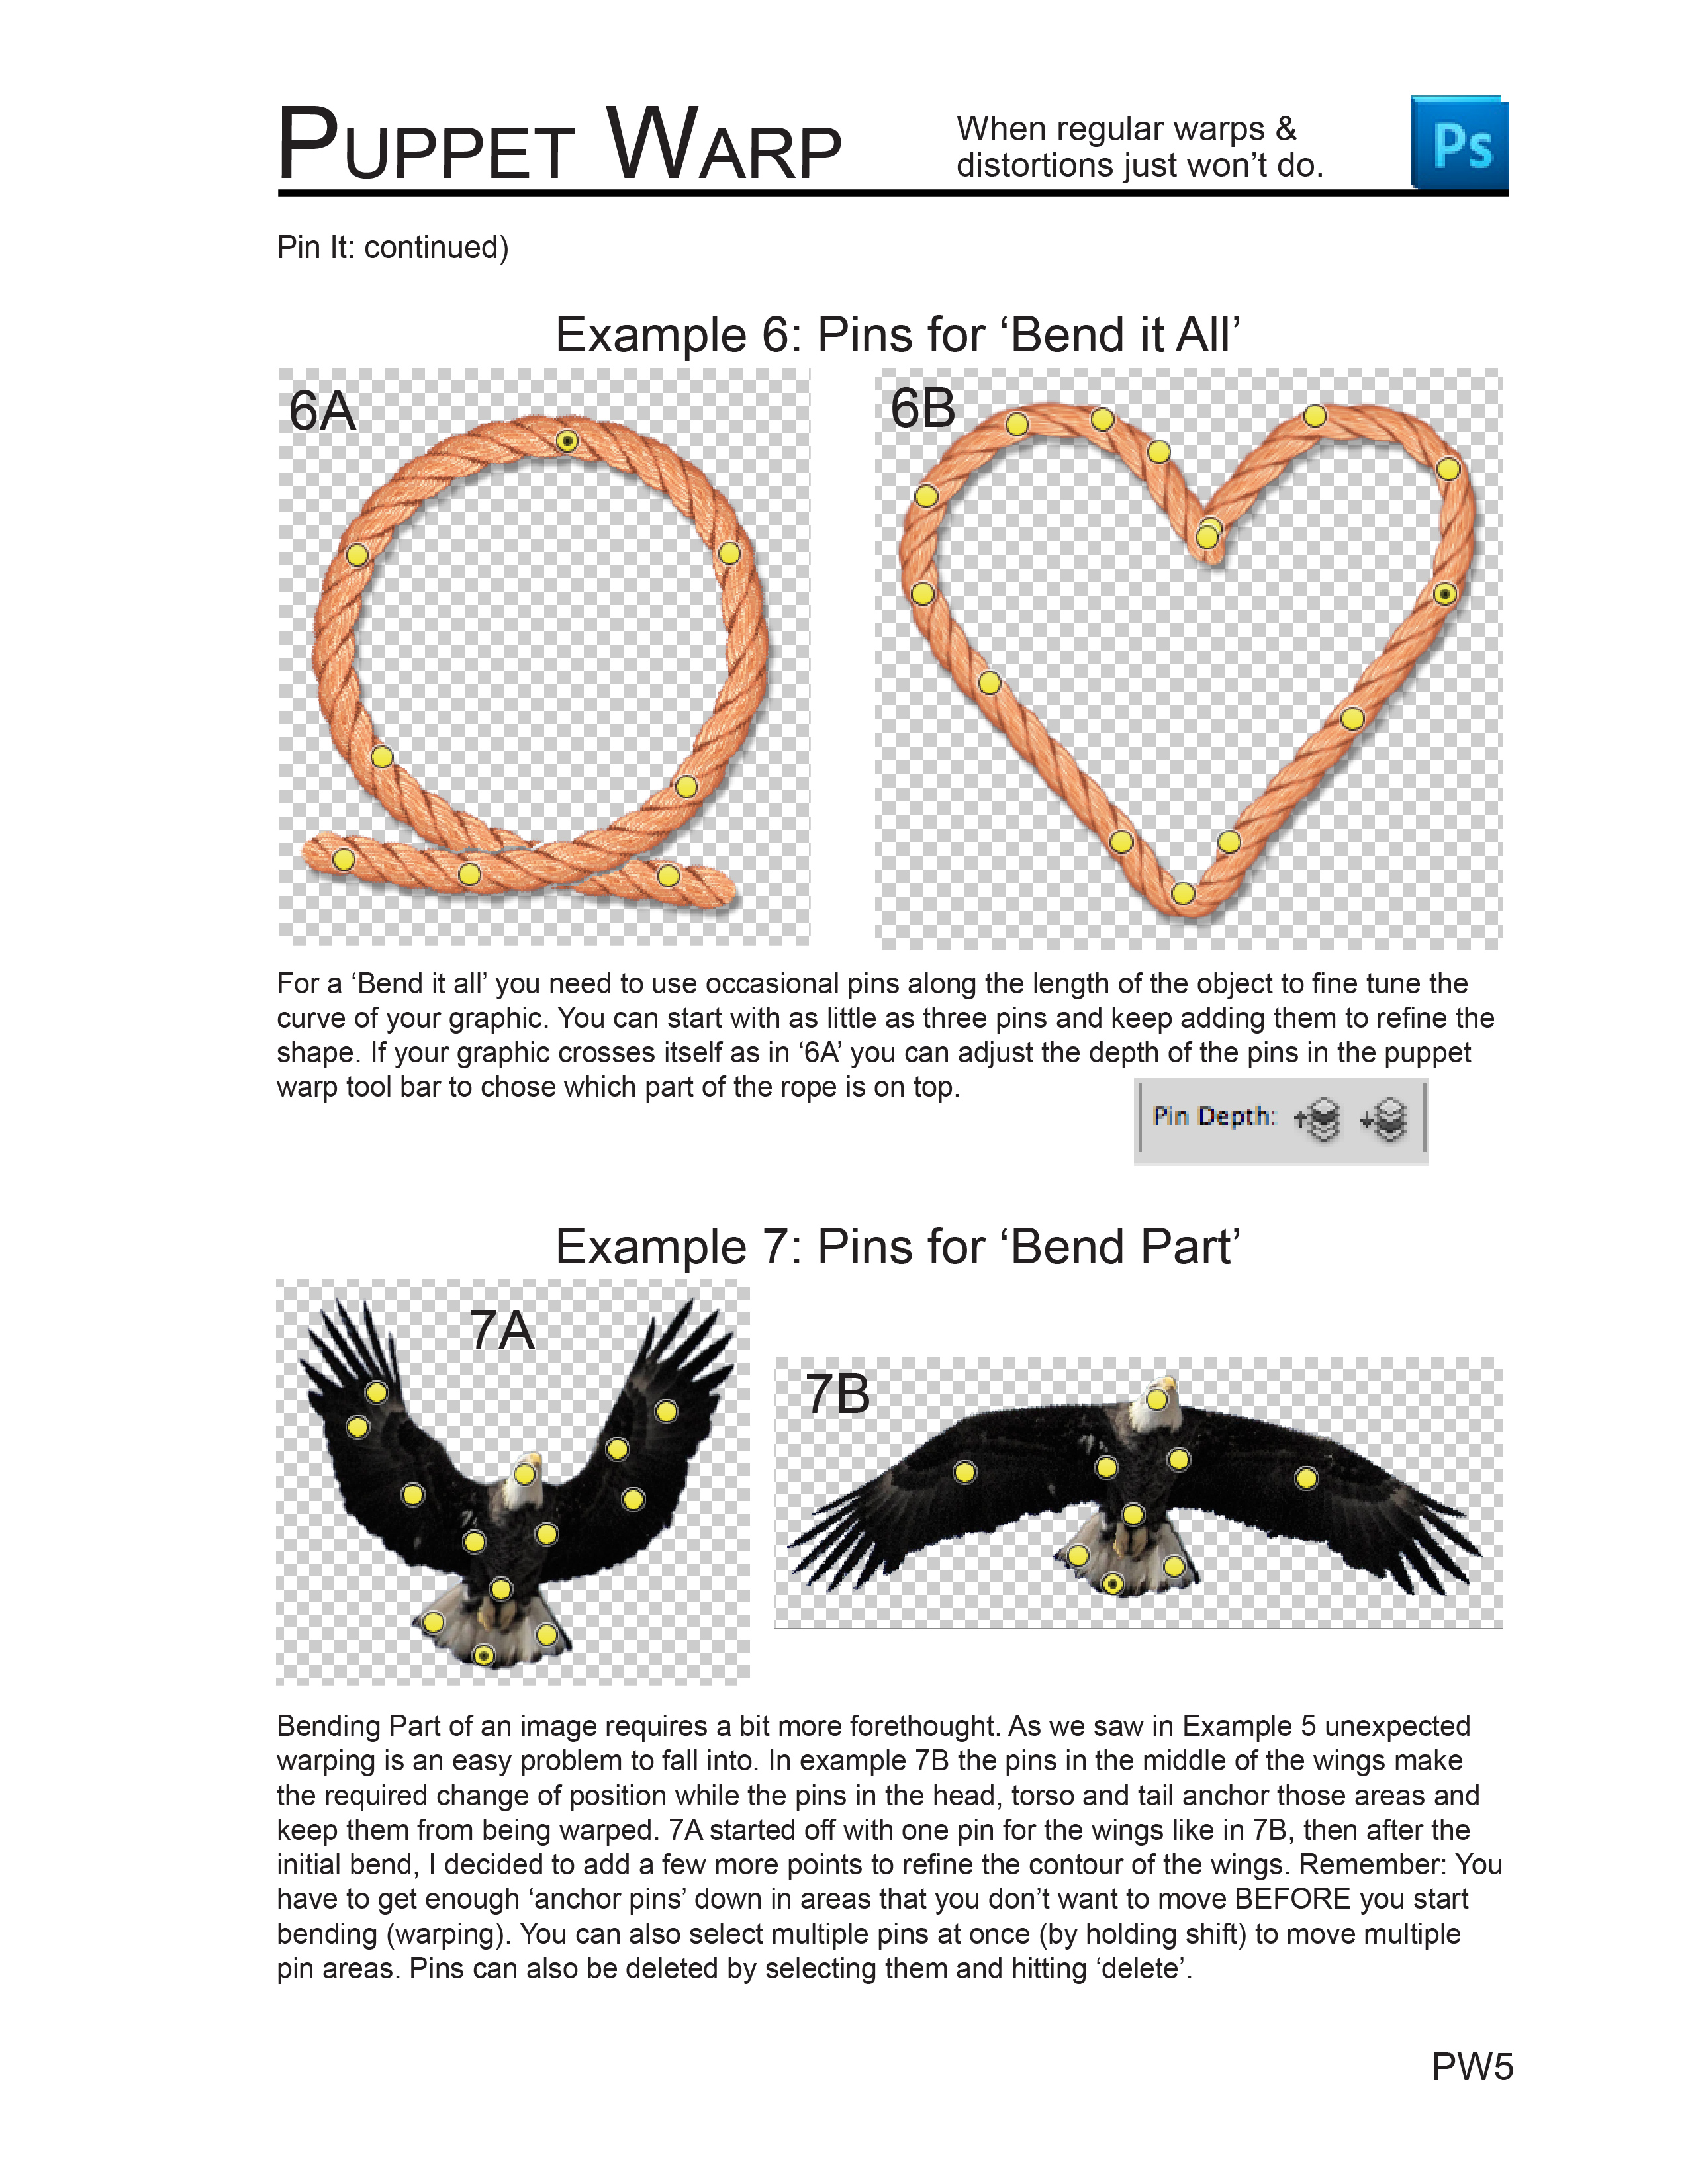 Puppet warp tutorial adobe photoshop tradigital art designs puppetwarptutorial 05 puppetwarptutorial 06 baditri Image collections